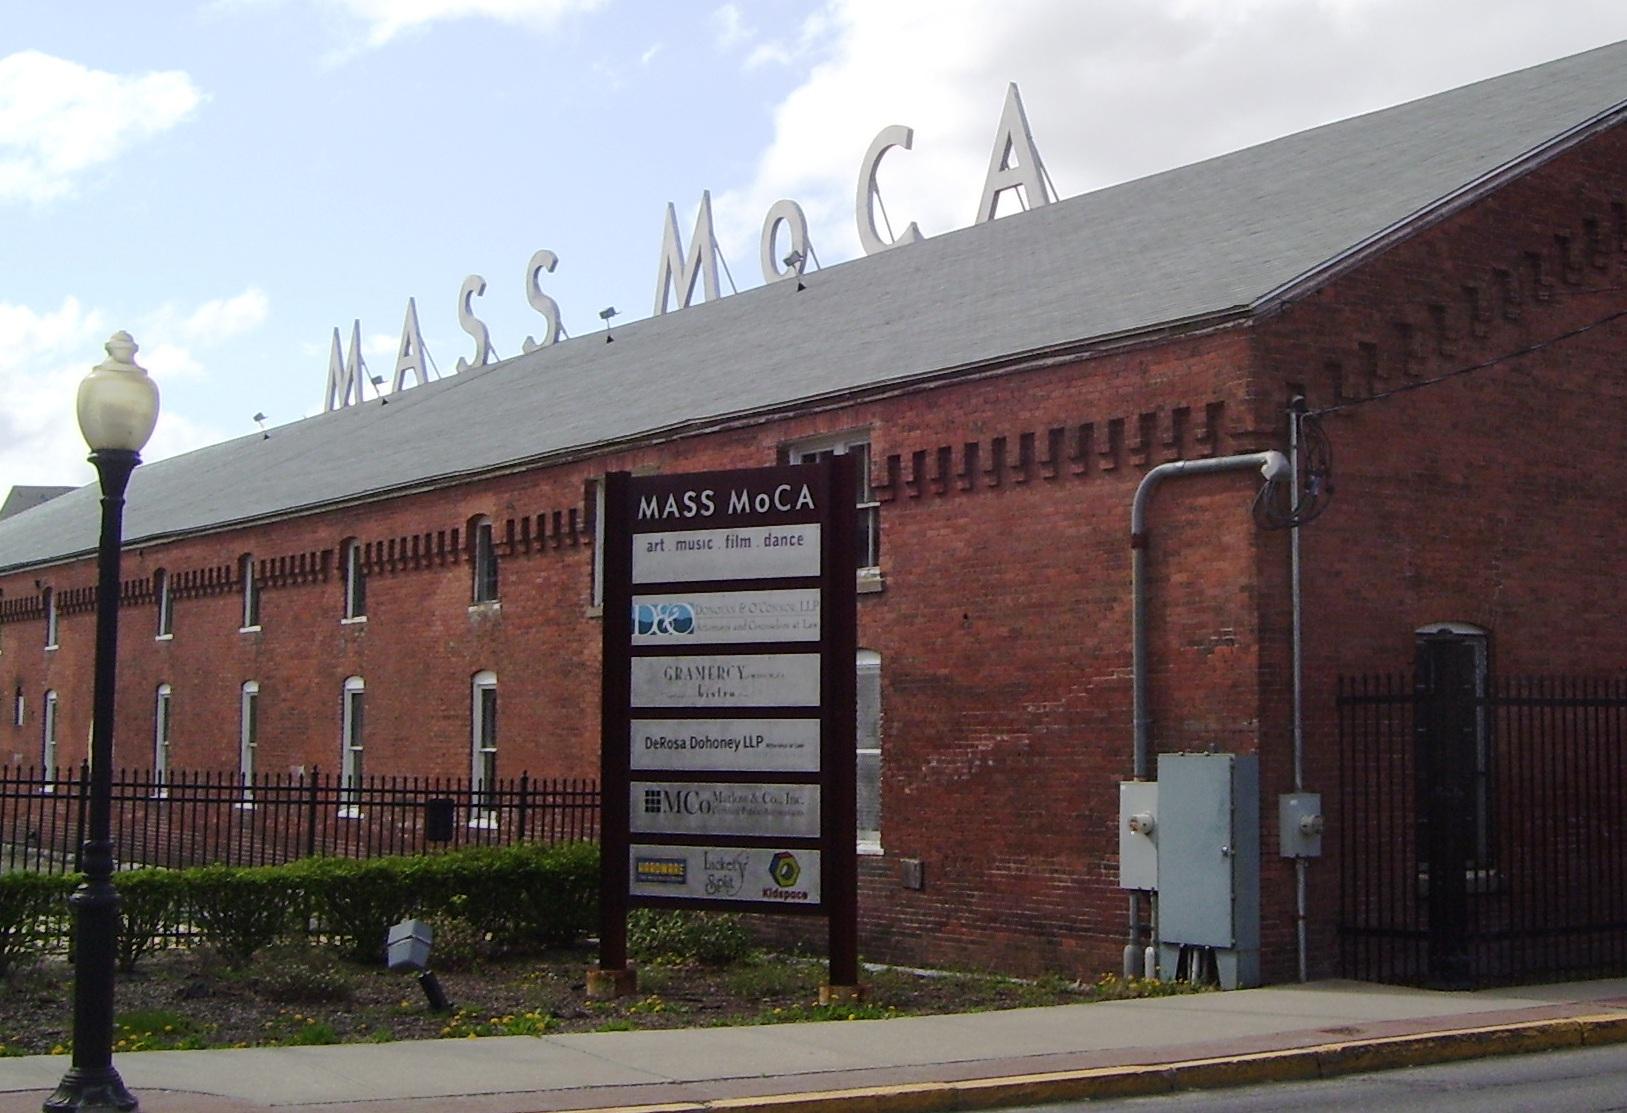 The Massachusetts Museum of Contemporary Art